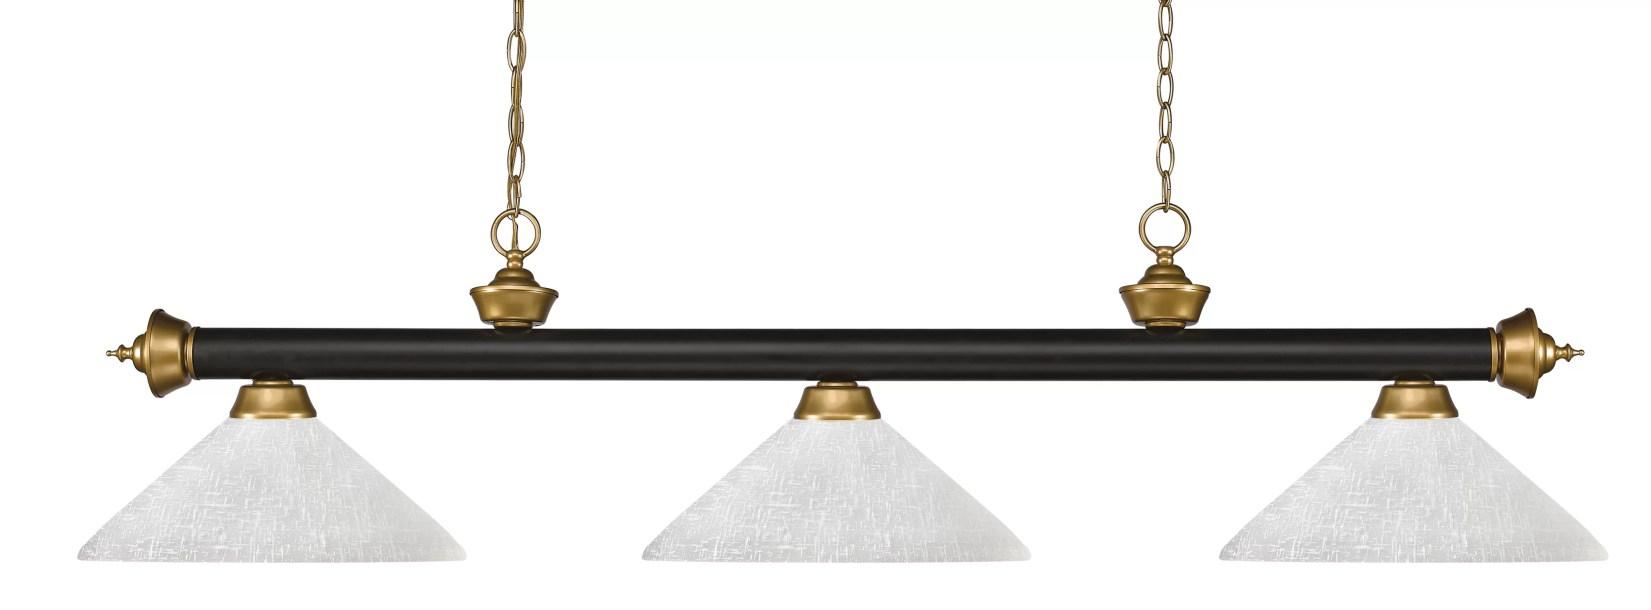 Brynlee 3 - Light Pool Table Lights Linear Pendant